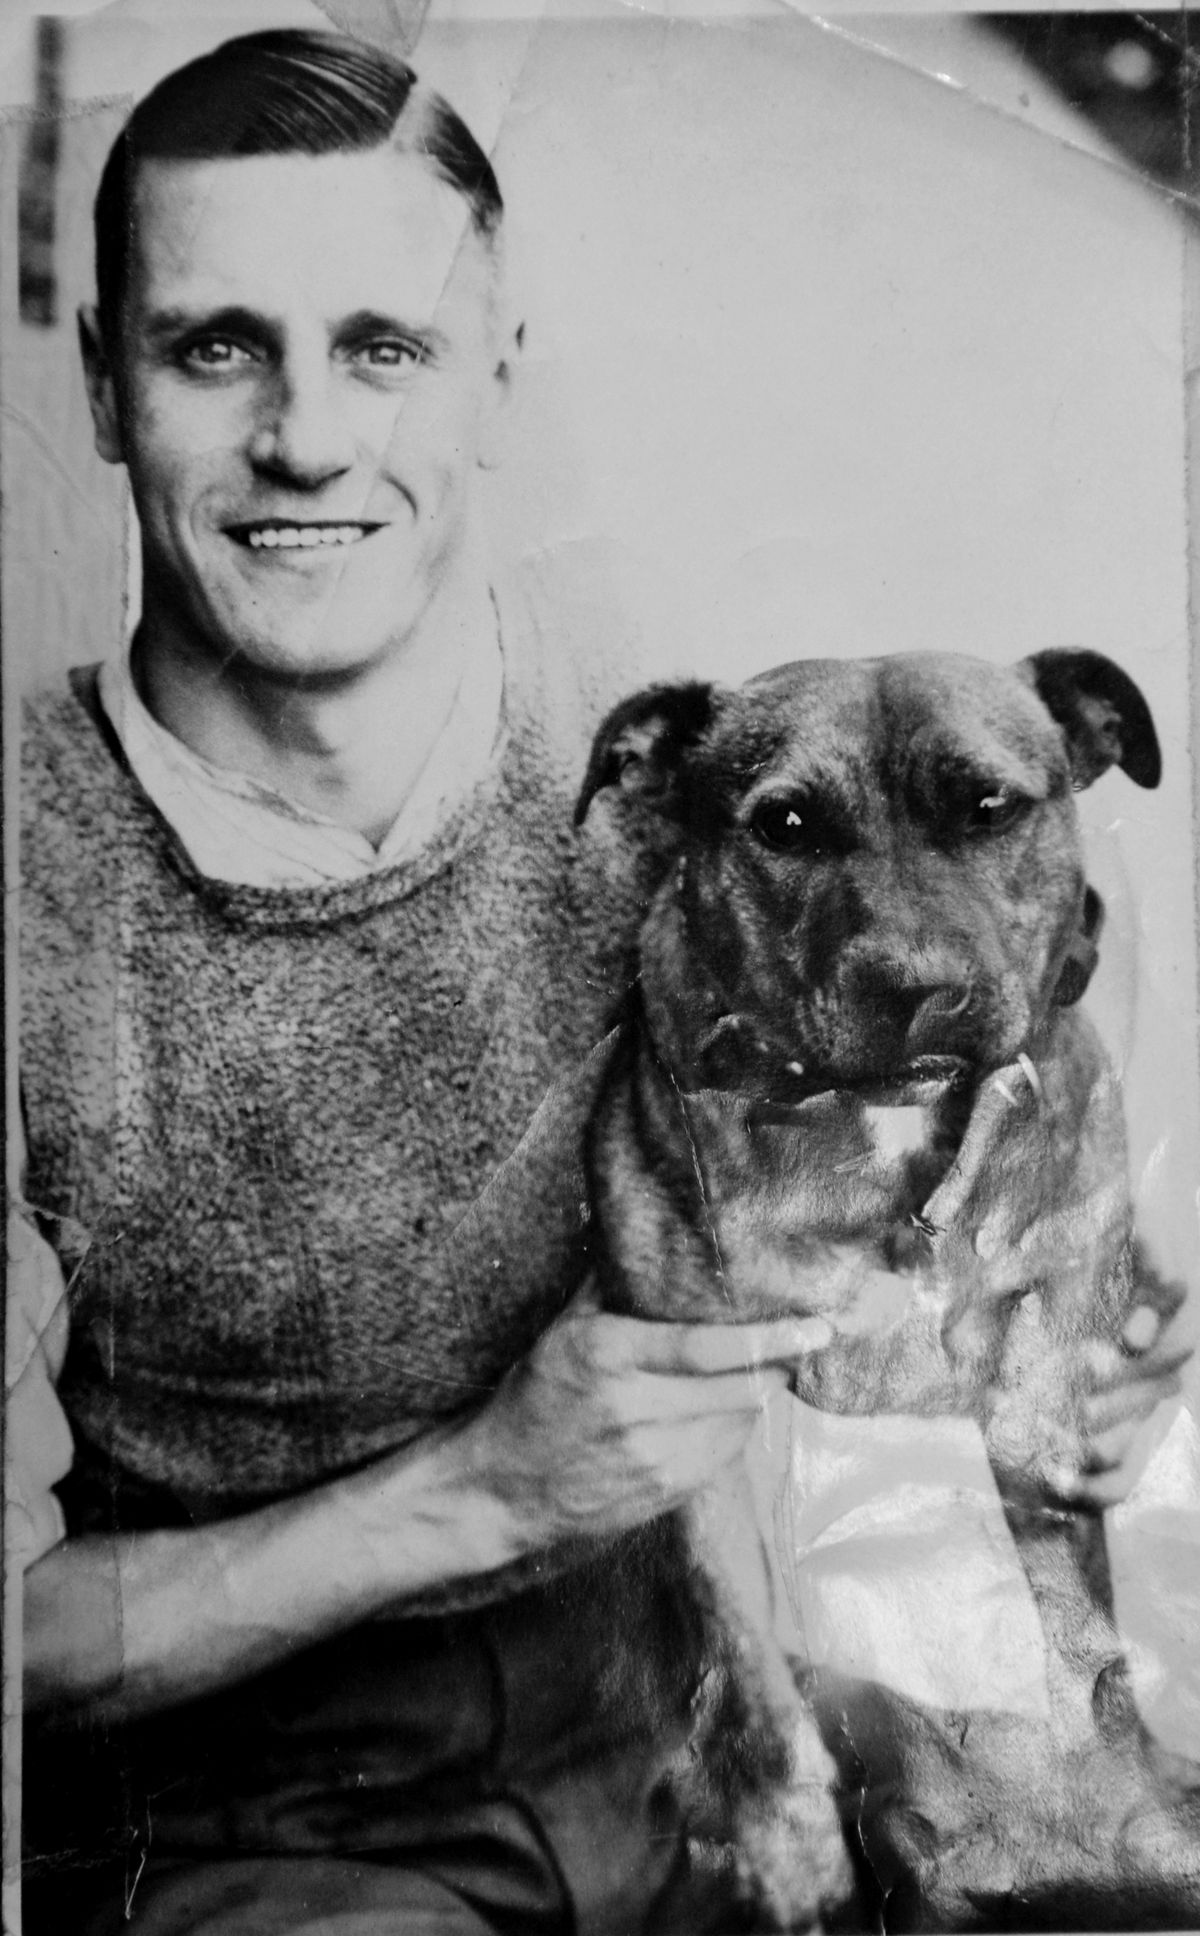 Tom Grosvenor was born in Netherton